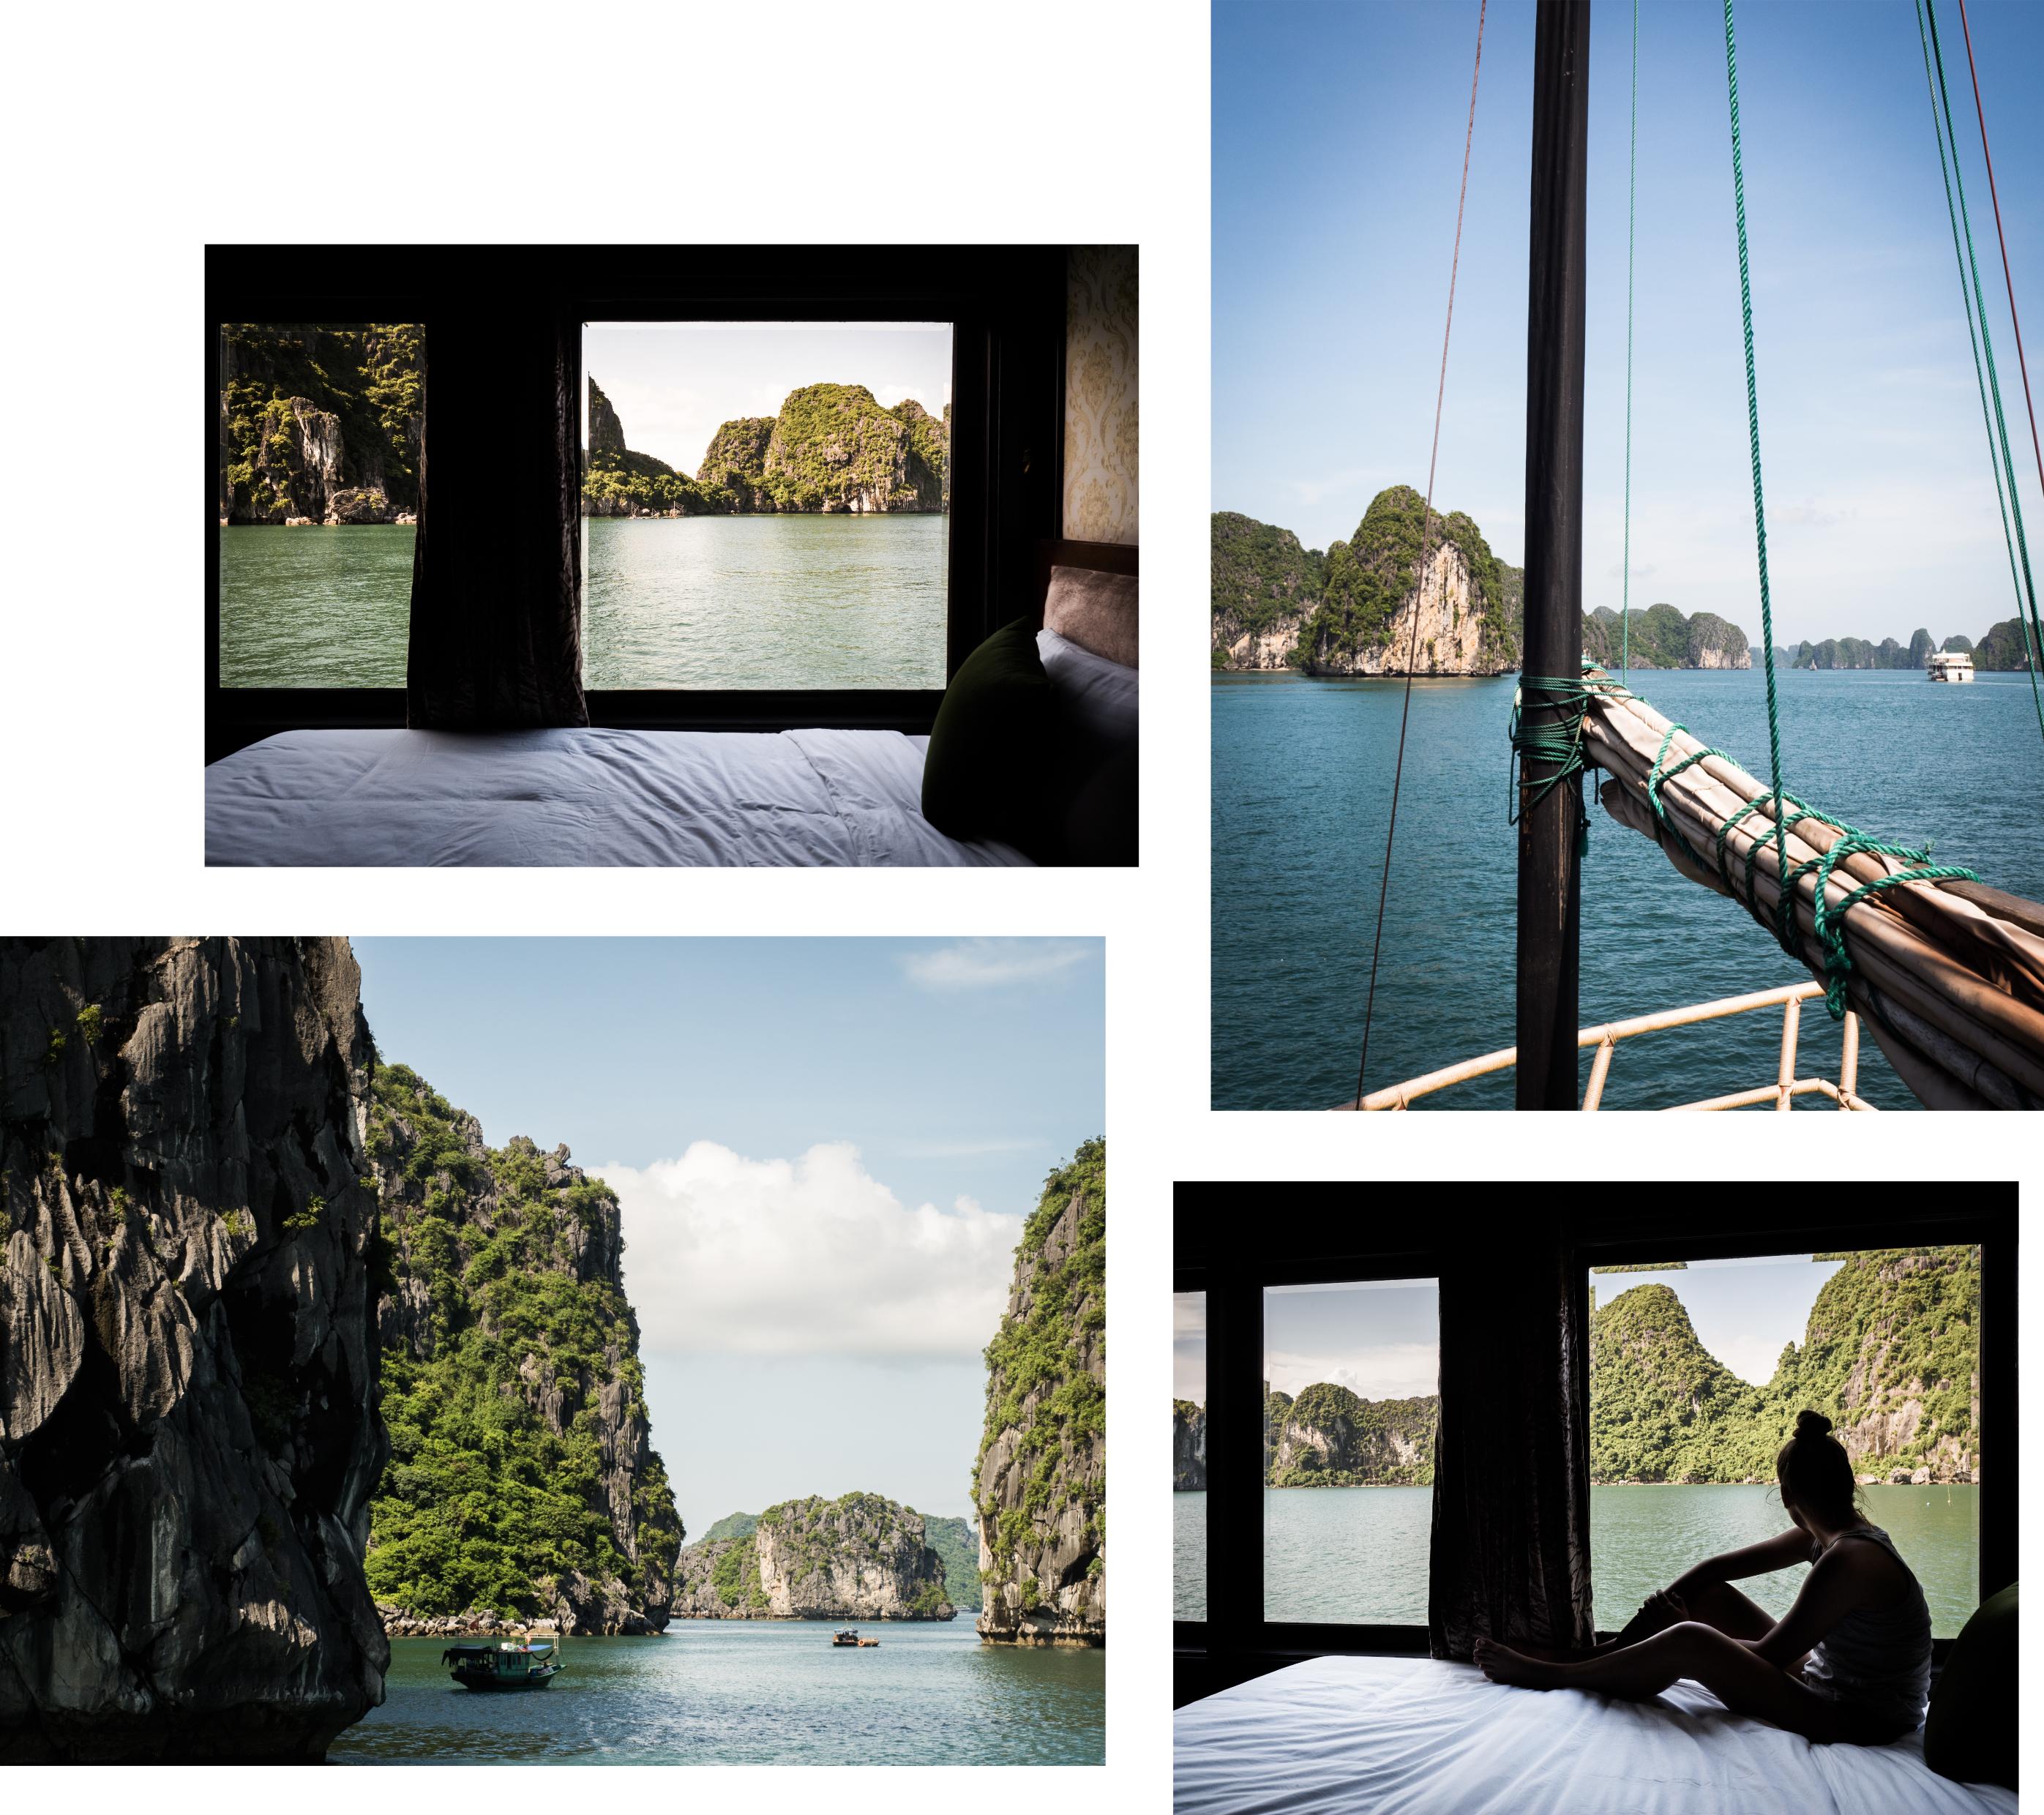 vietnam - bai tu long bay - baie d'halong en jonque